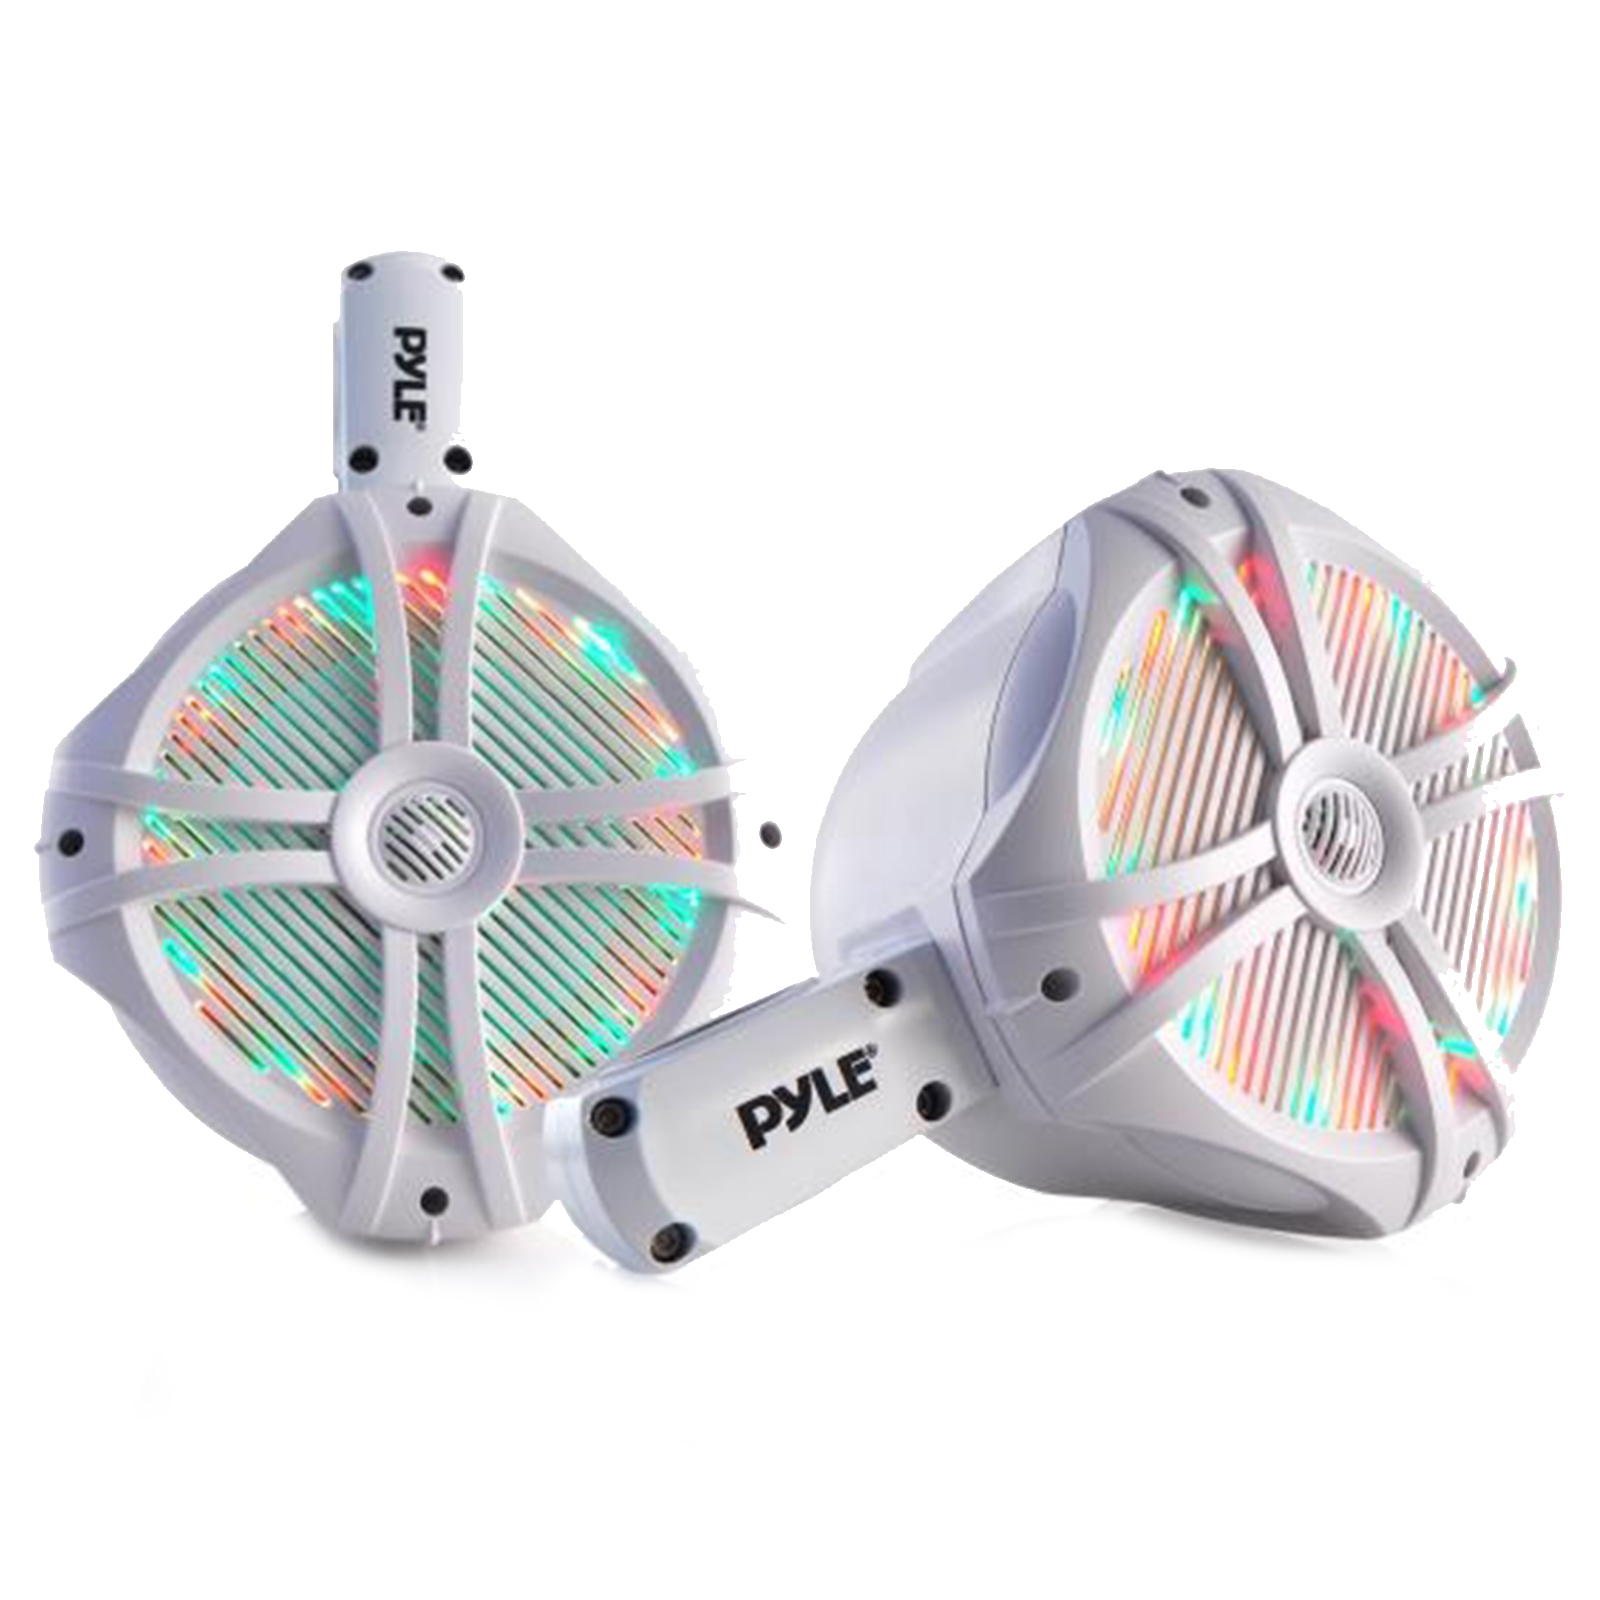 "Dual Marine Wakeboard Water Resistant Speakers, Built-in Programmable Multi-Color LED Lights, 6.5"" Tower Speakers,... by Pyle"